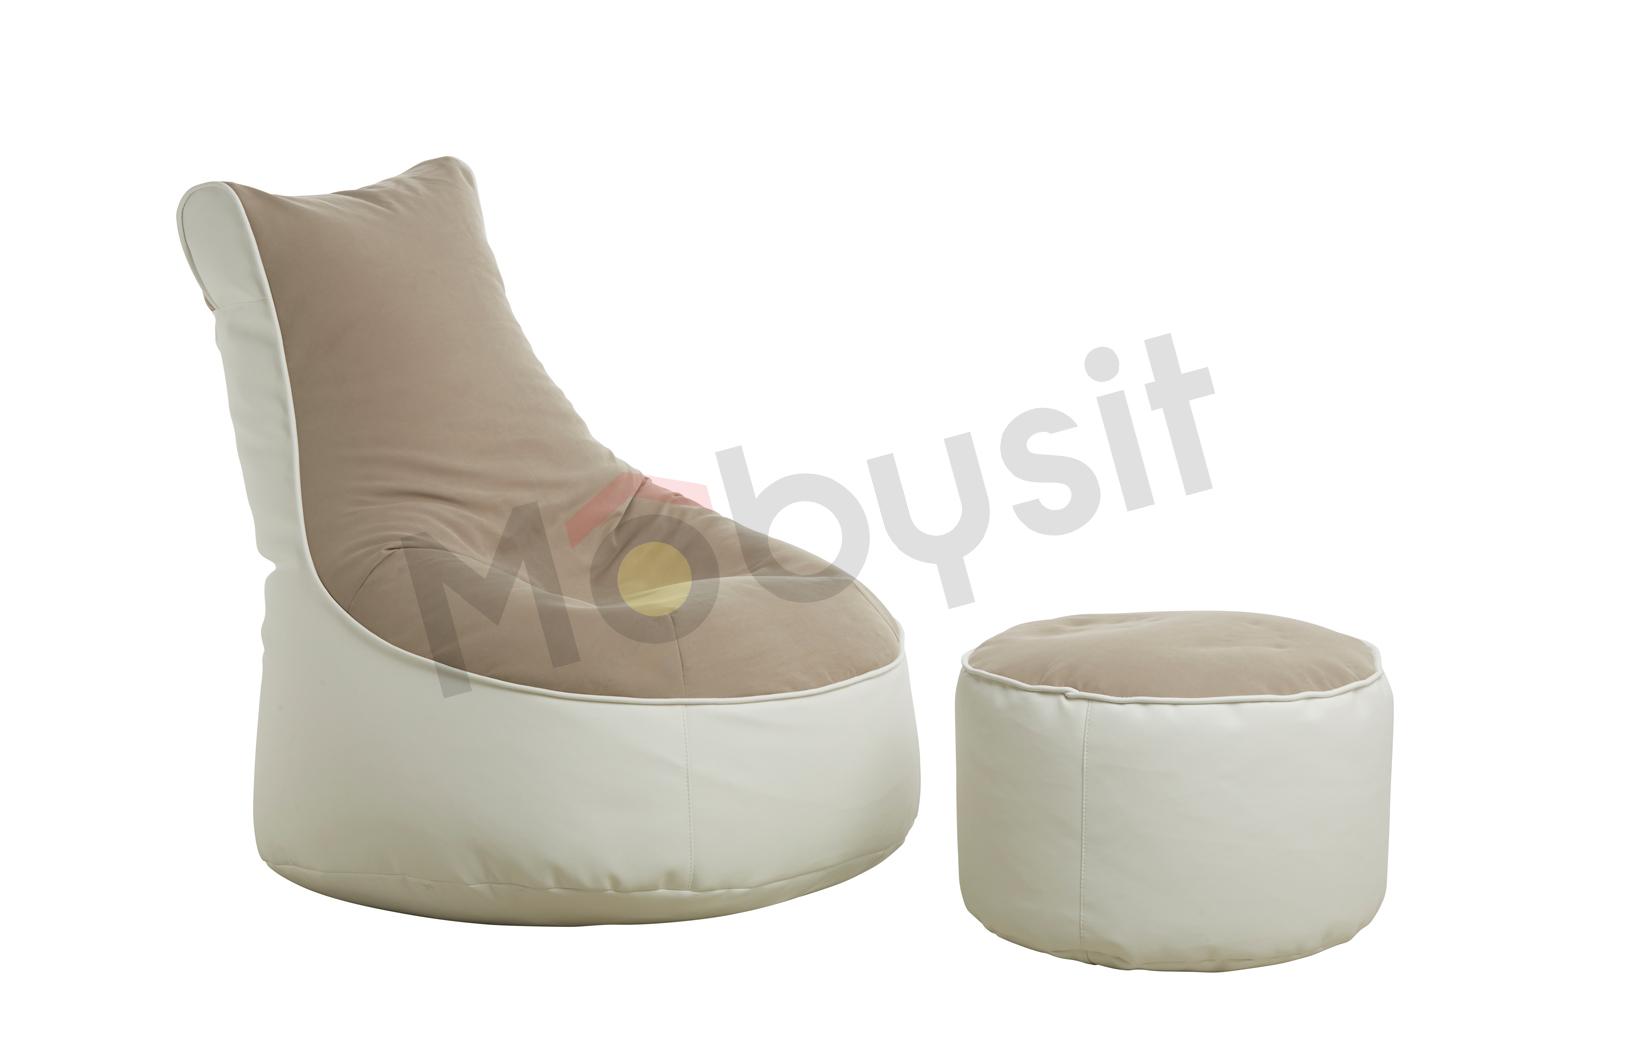 SAKWA BIG comfort beige-white